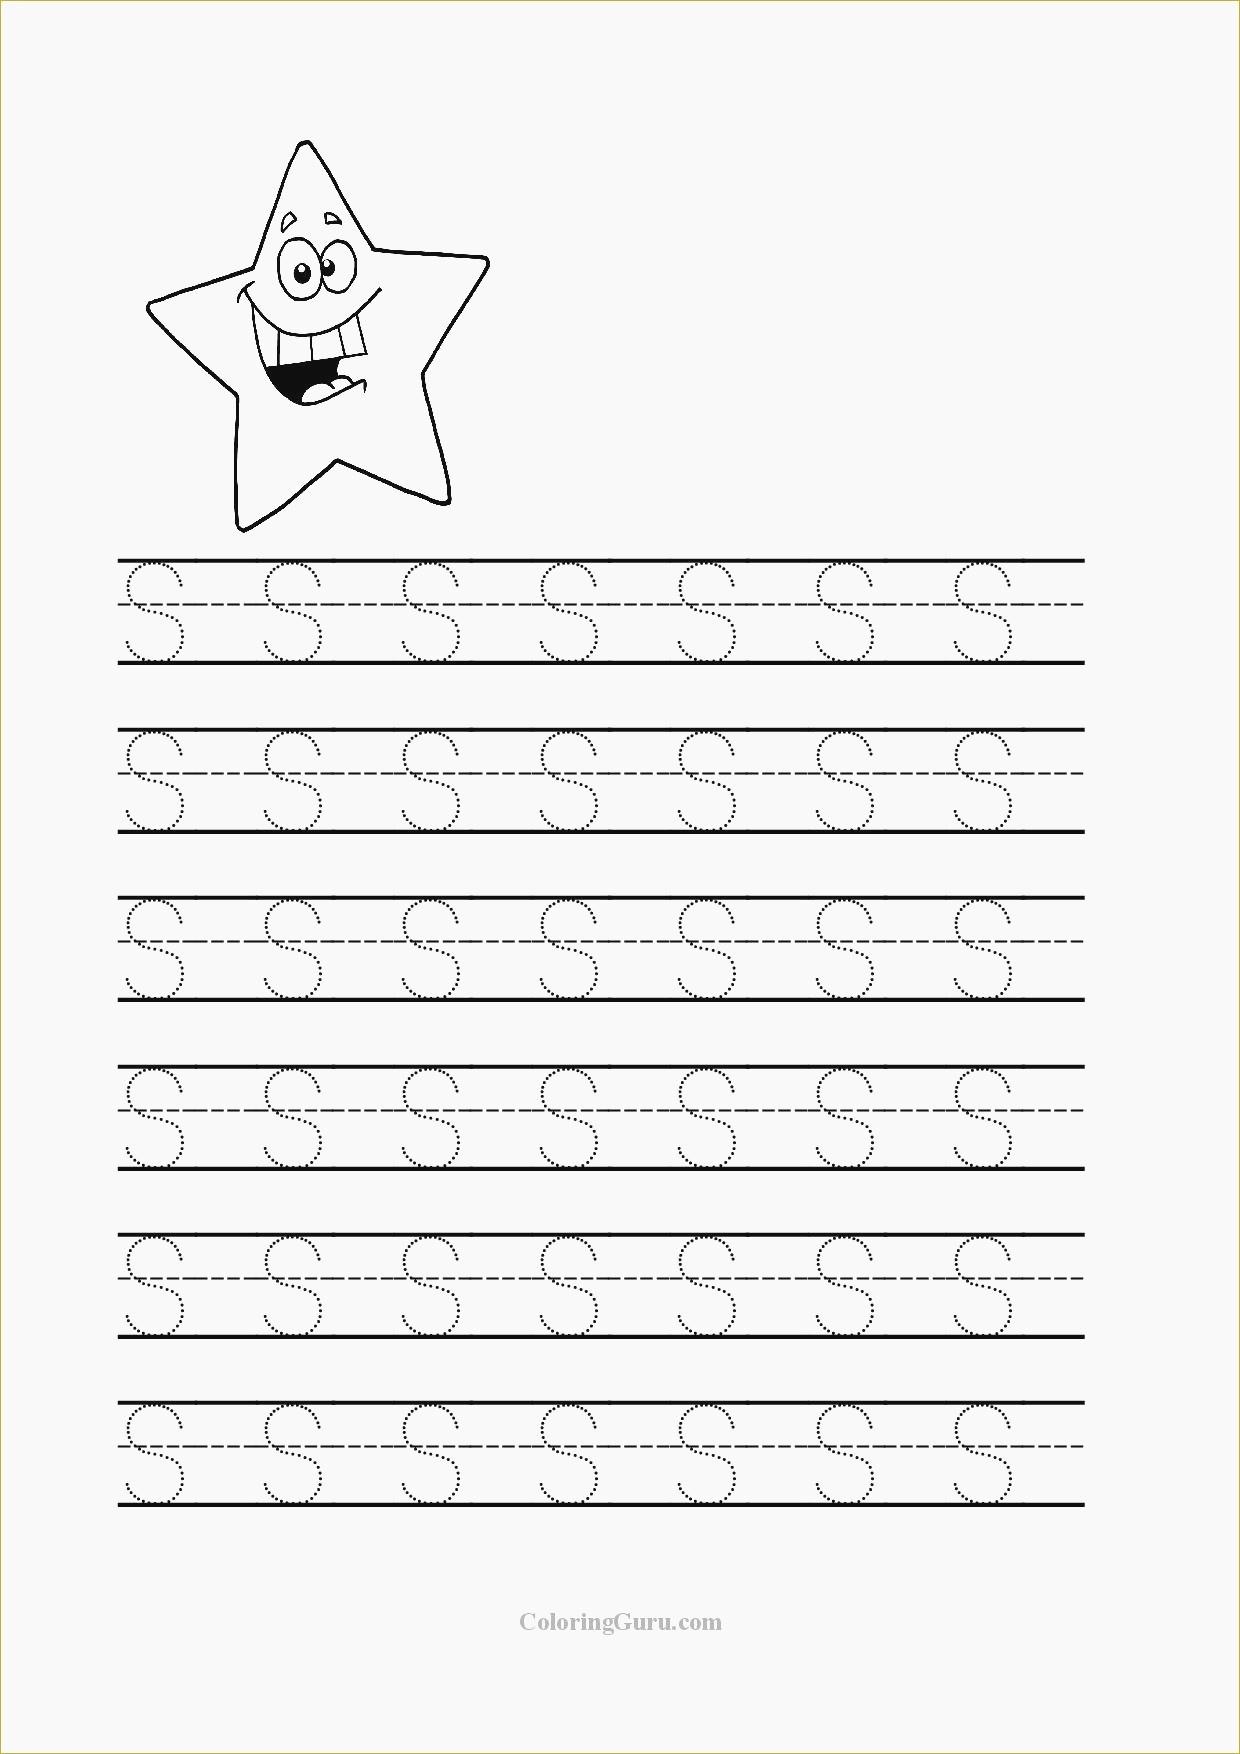 Printable Tracing Paper Beautiful Free Name Tracing Worksheets For - Free Printable Name Tracing Worksheets